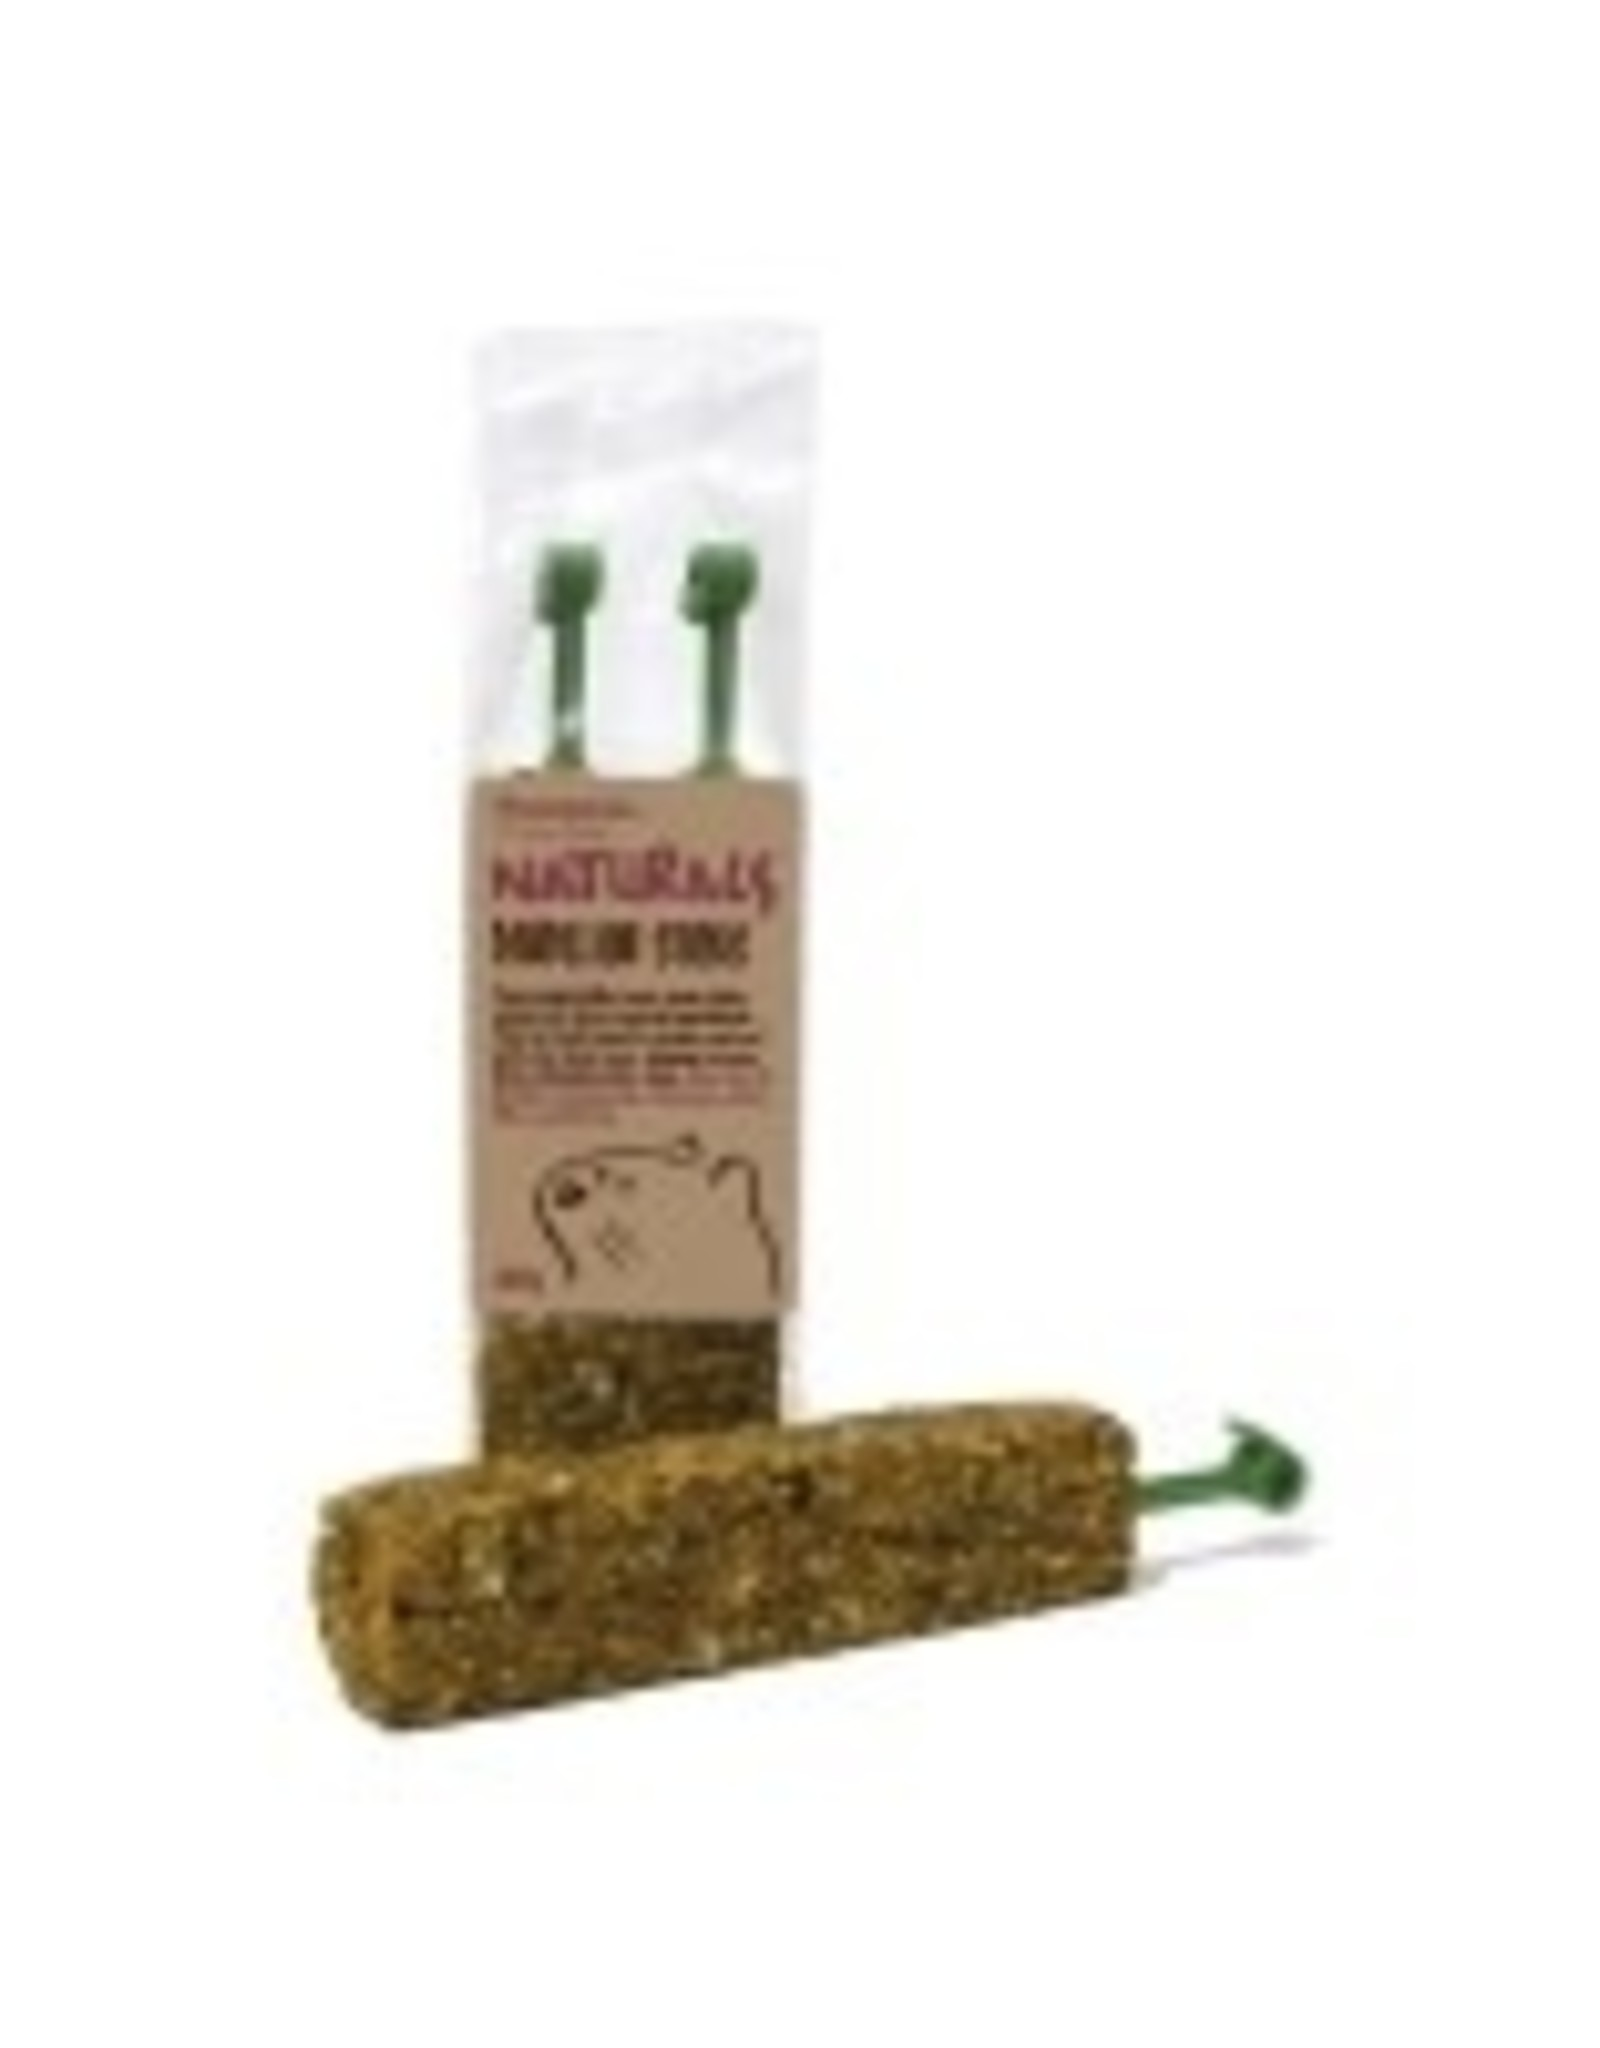 Rosewood Dandelion Sticks